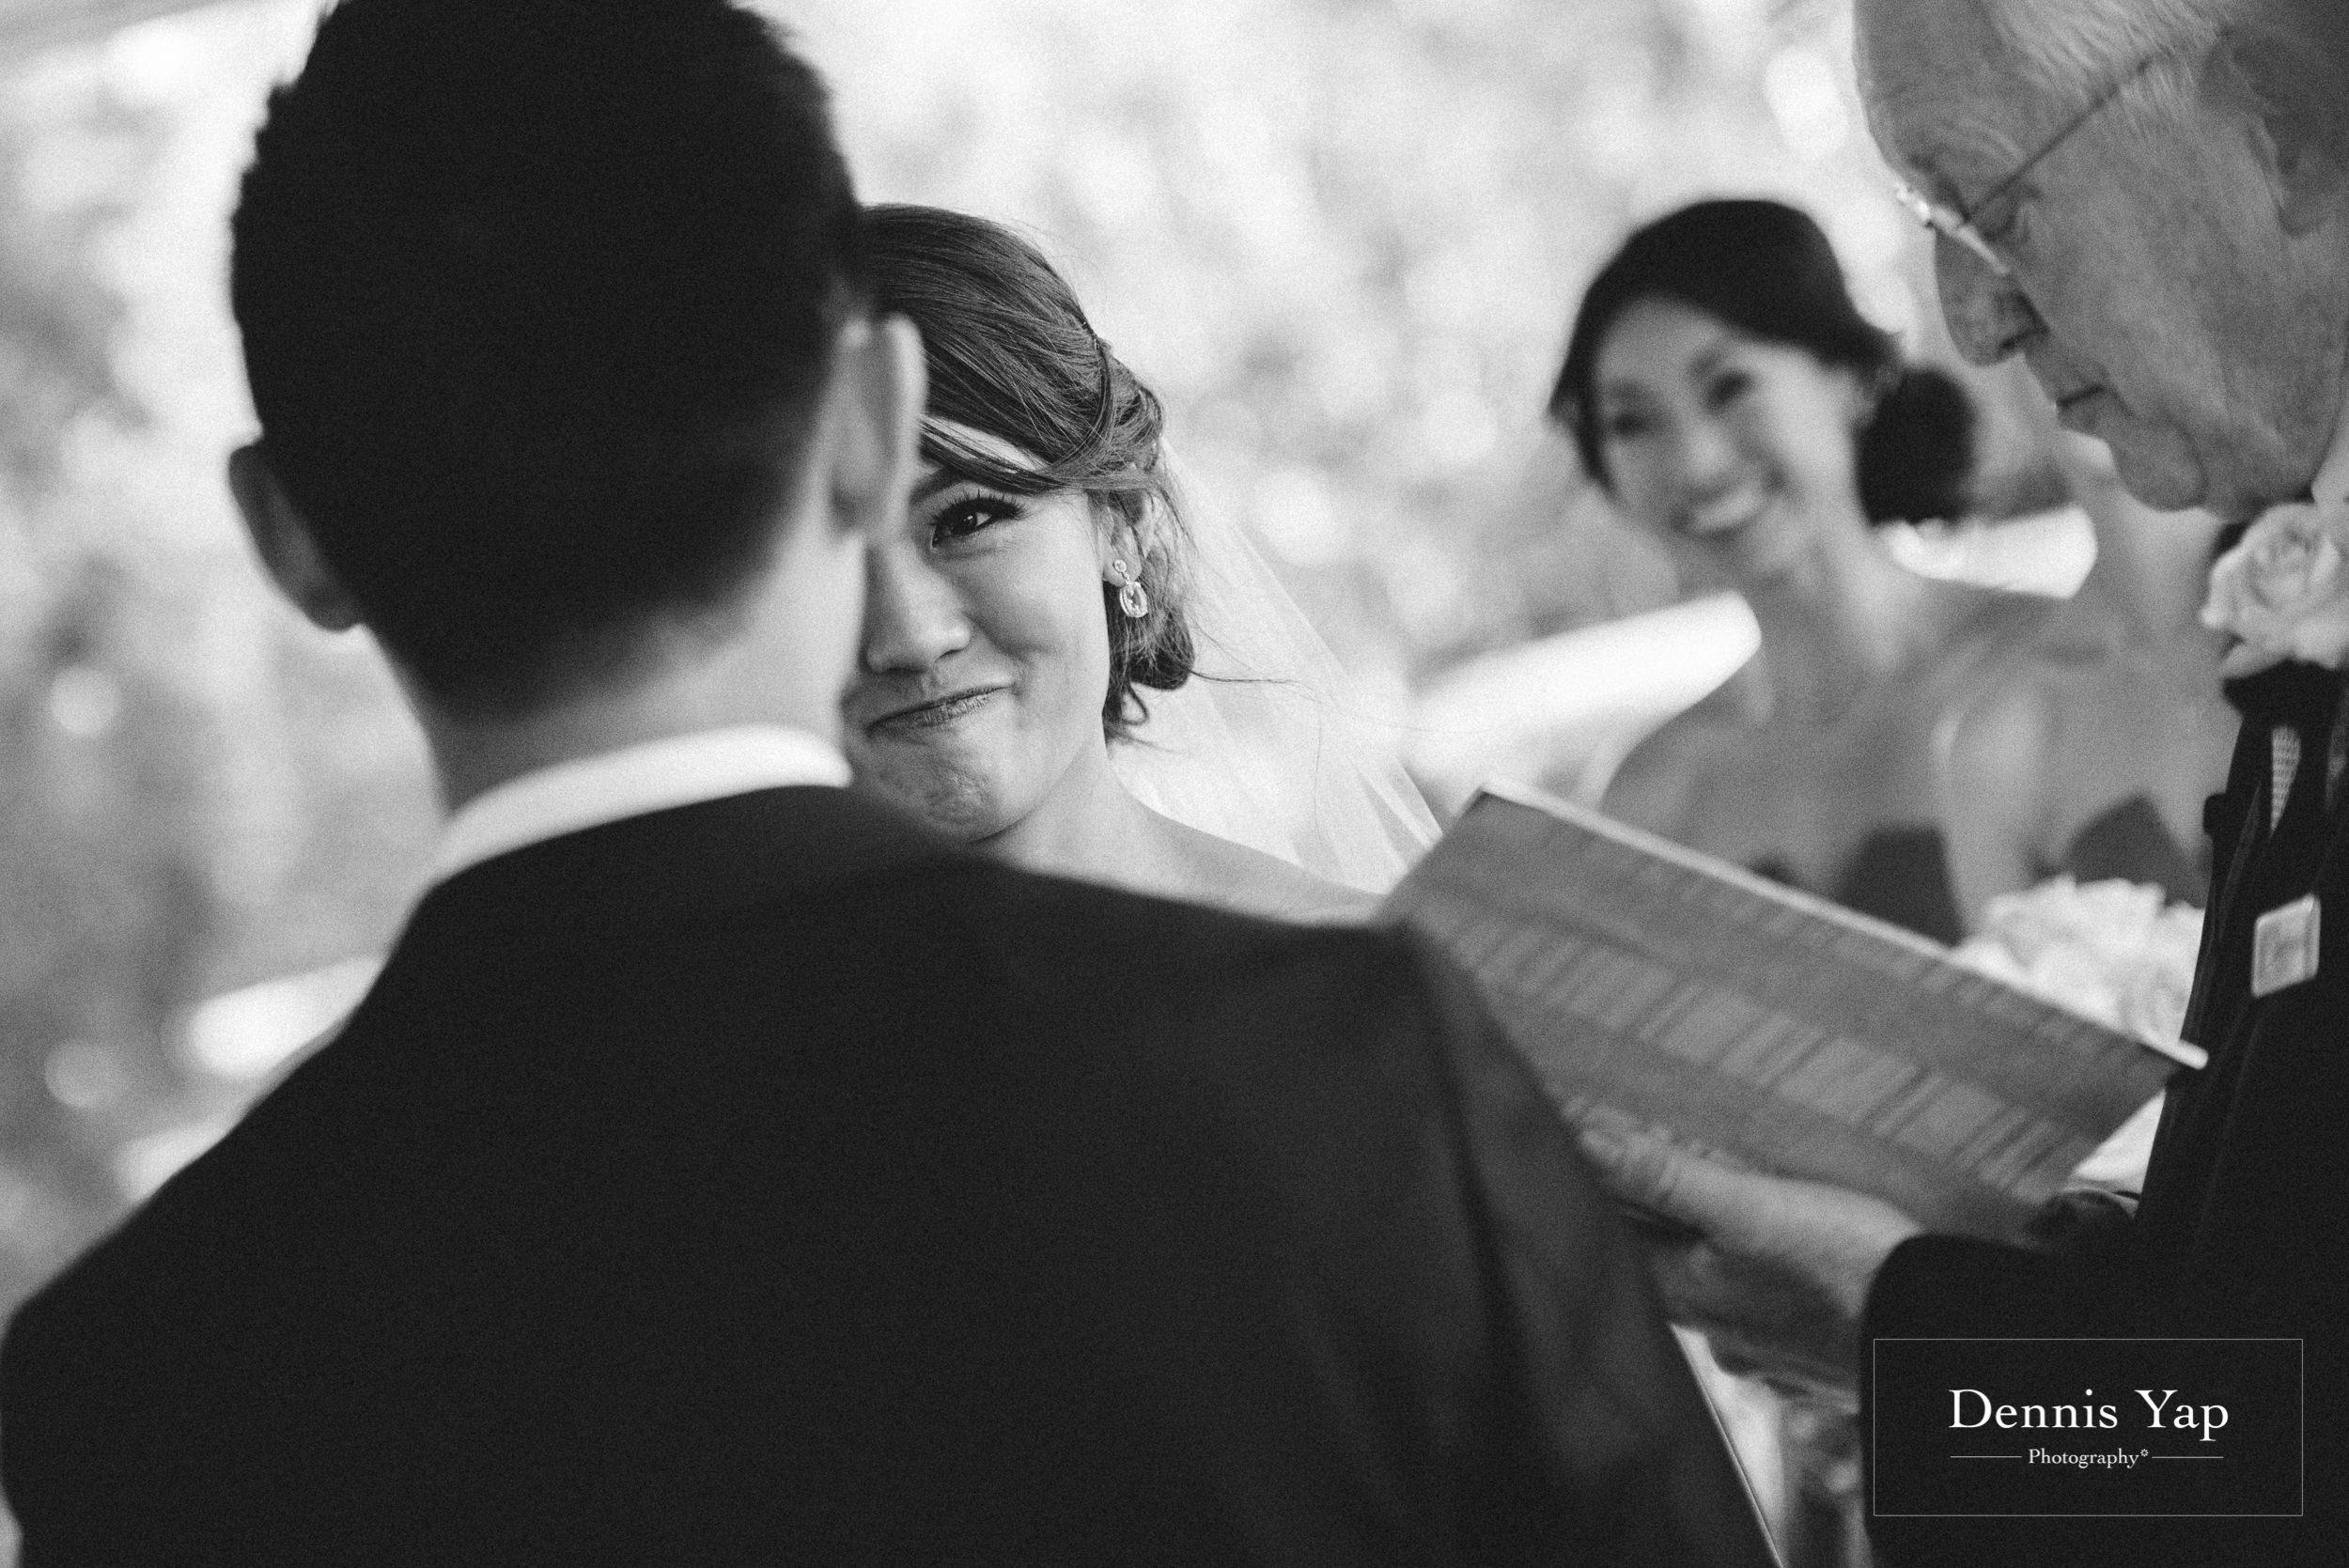 thang veng vietnamese wedding brisbane dennis yap photography malaysia wedding photographer-24.jpg